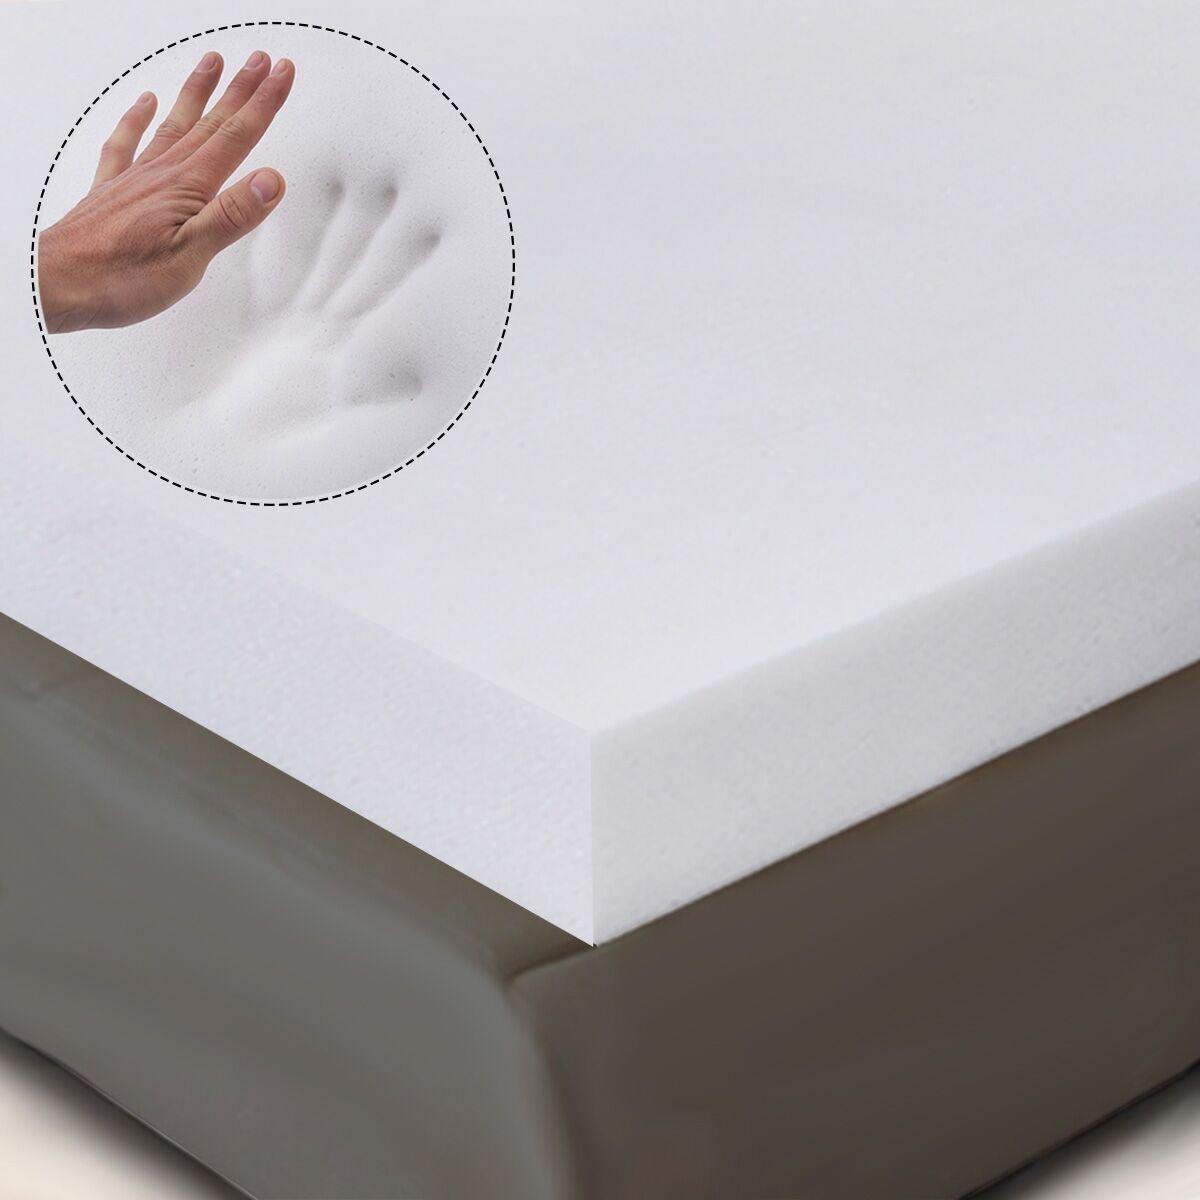 MasterPanel - 3'' Queen Size Memory Foam Mattress Pad, Bed Topper 80''x60''x3'' #TP4513